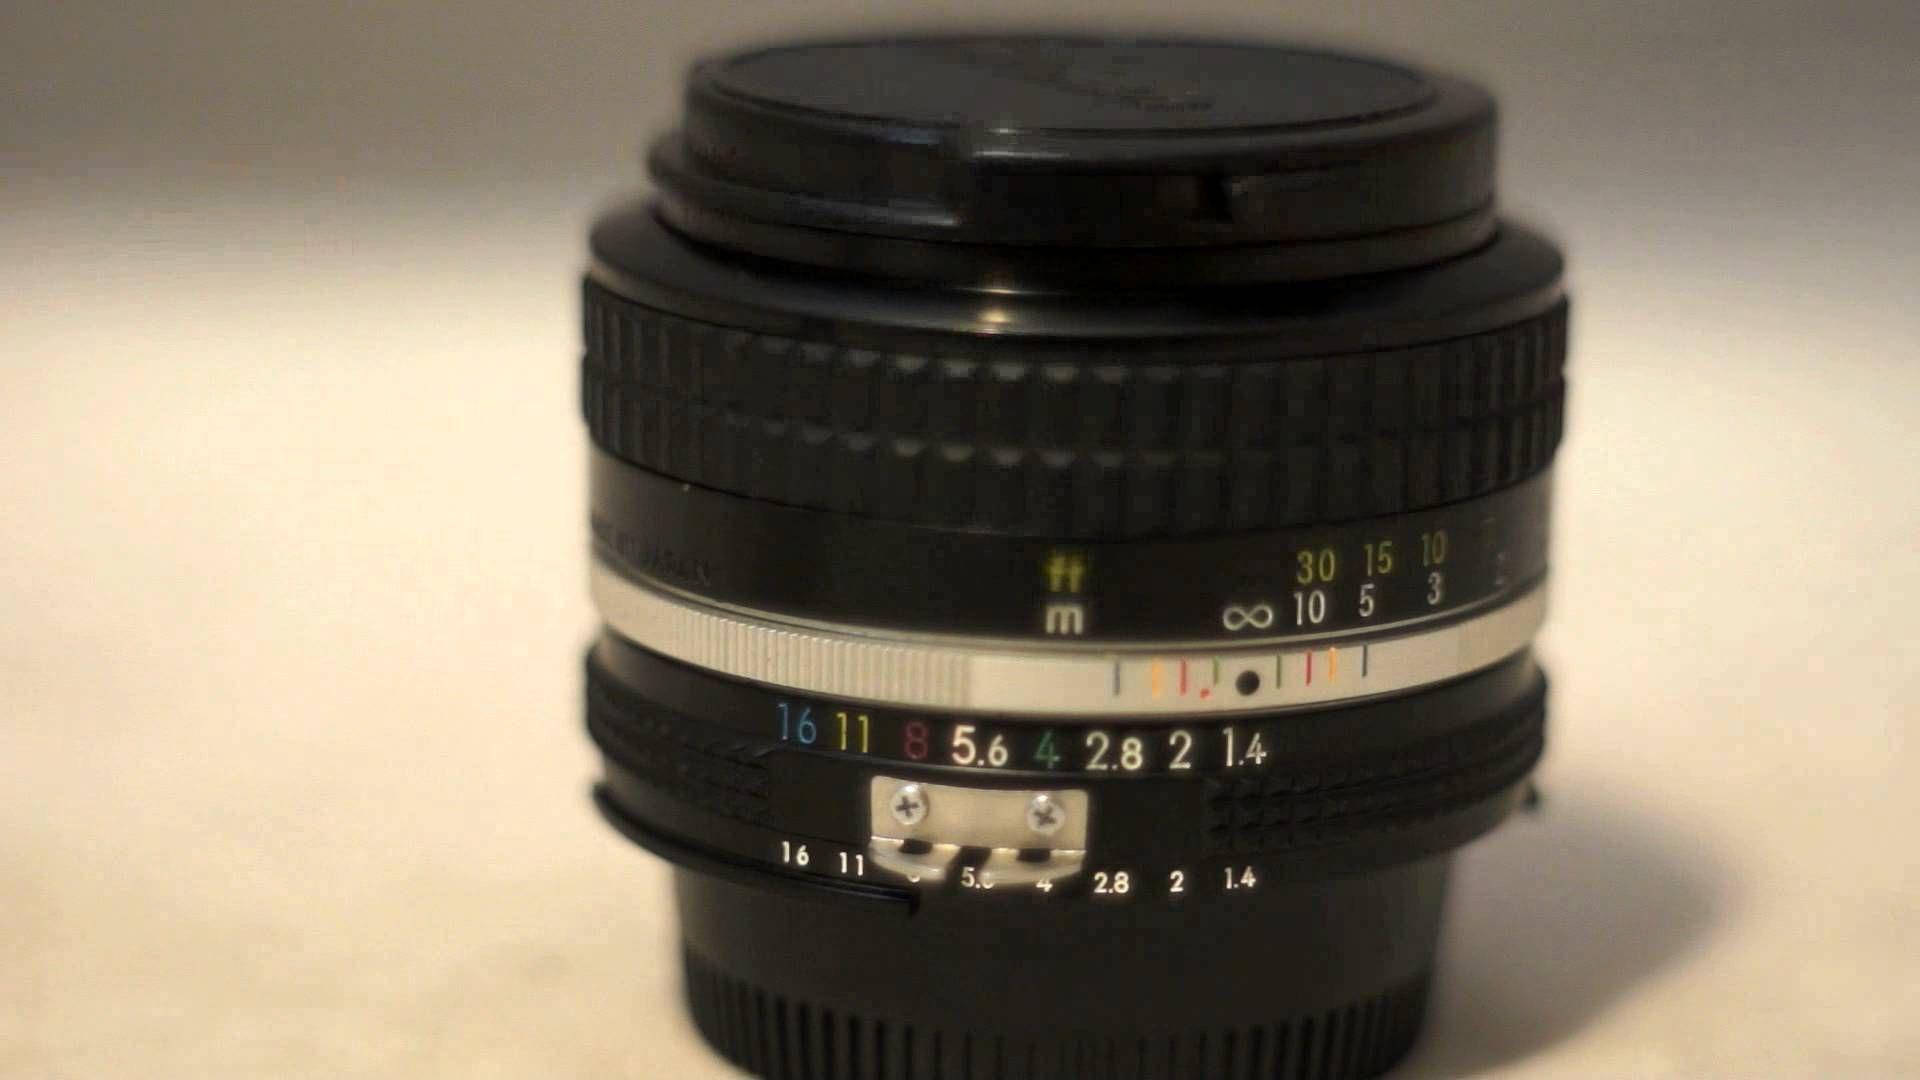 Nikon Nikkor 50mm F1 4 Ai Vintage Manual Focus Prime Lens Review Prime Lens Manual Focus Lens